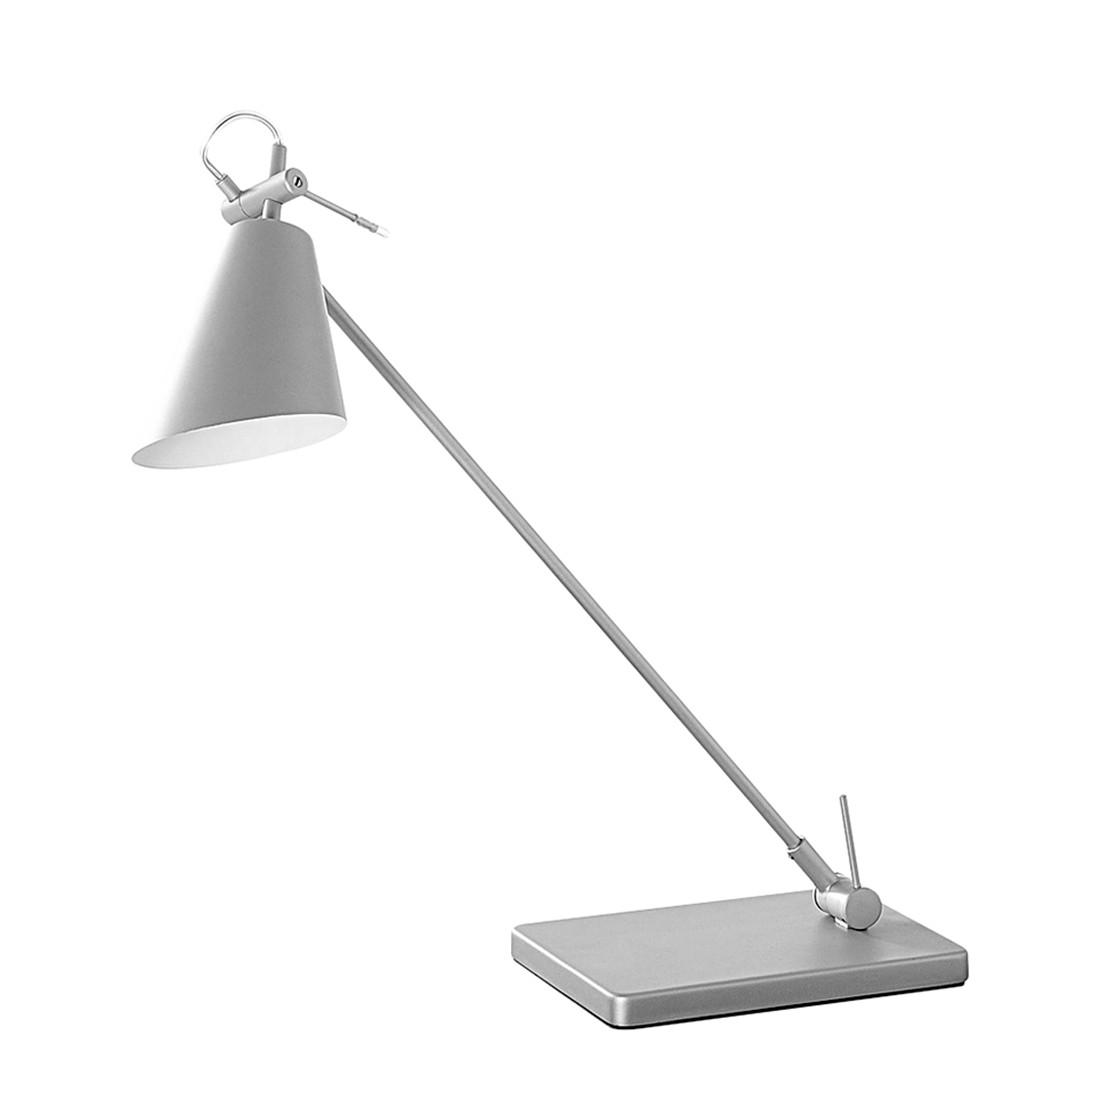 Tischleuchte First 1 LED ● Metall ● Grau ● 1-flammig- Blanke Design A+